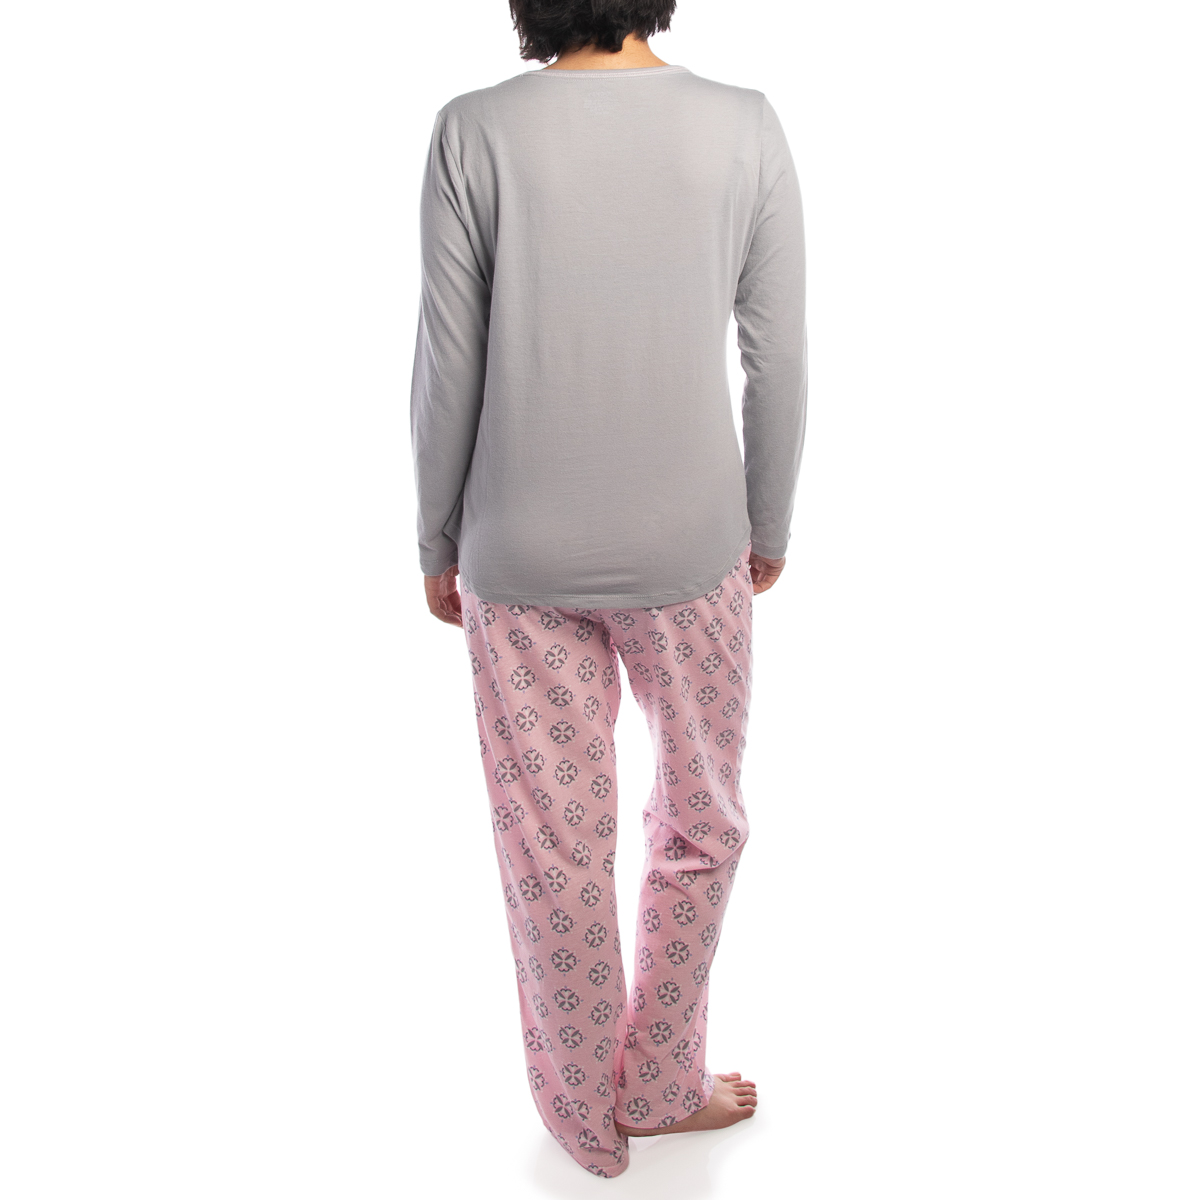 2-Piece-Jockey-Cotton-Pajamas-For-Women-Set-Long-Sleeve-Top-Bottom-PJs-Sleepwear thumbnail 8